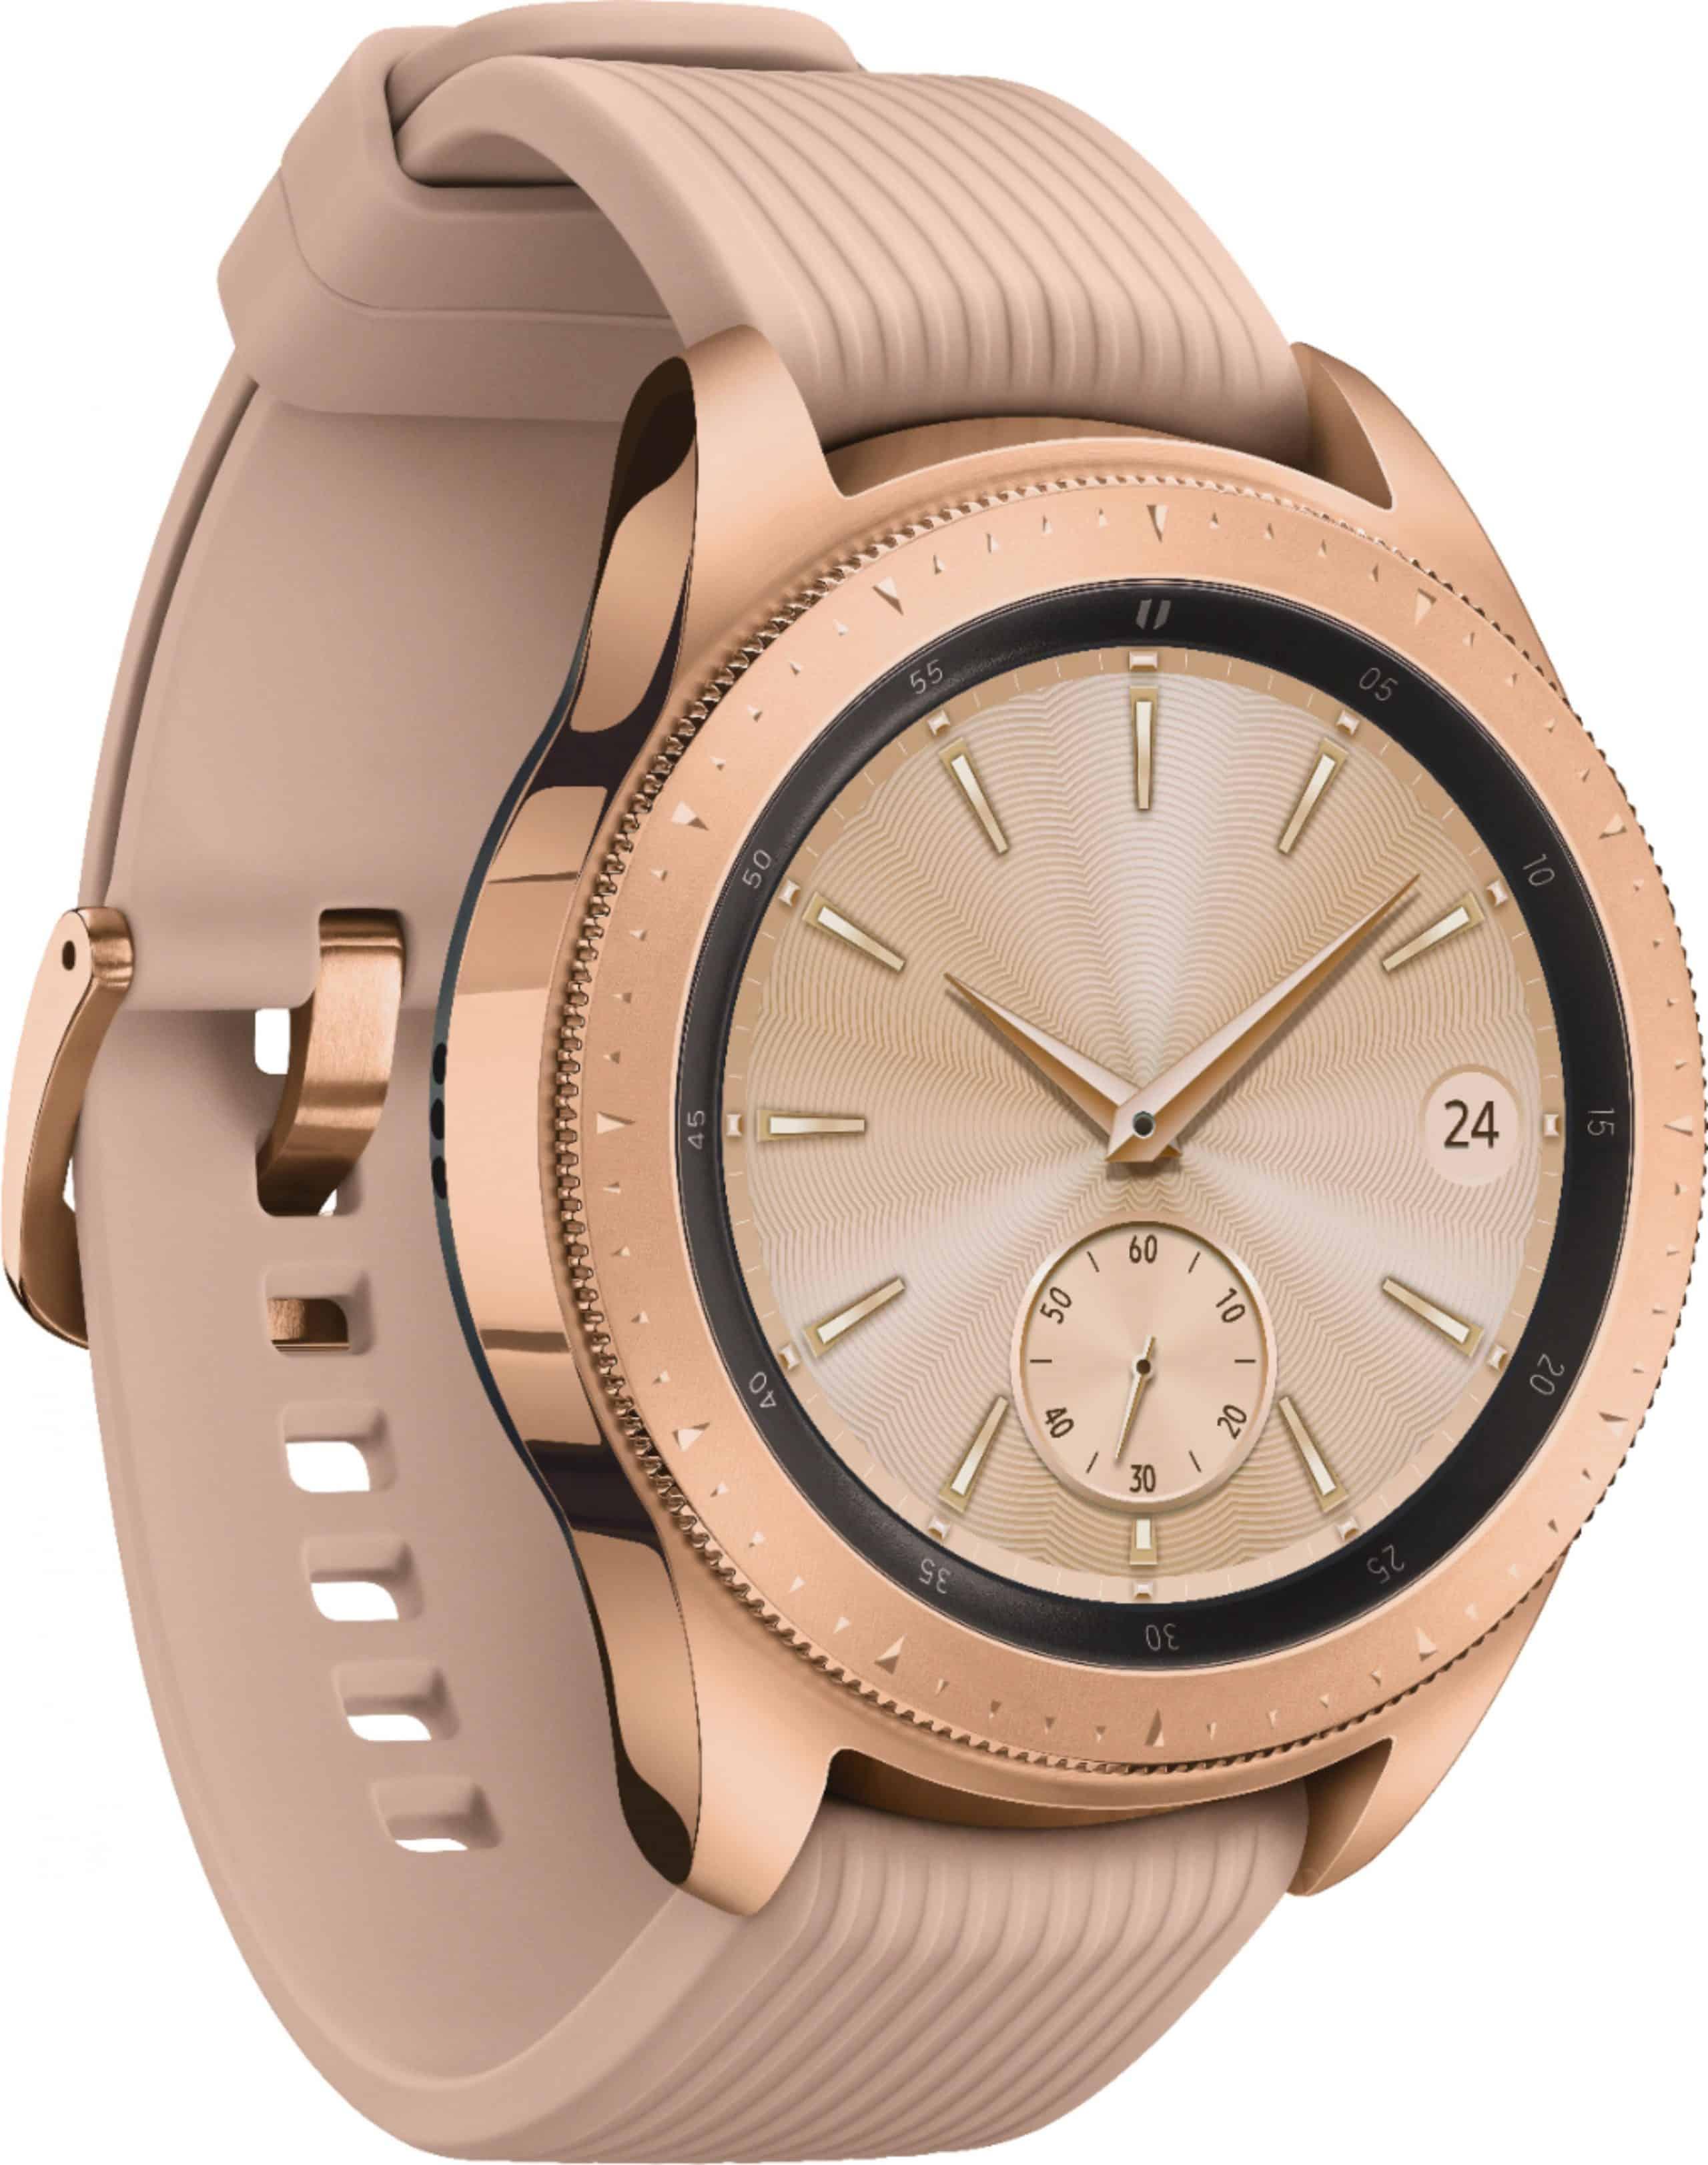 Samsung Galaxy Smartwatch 1